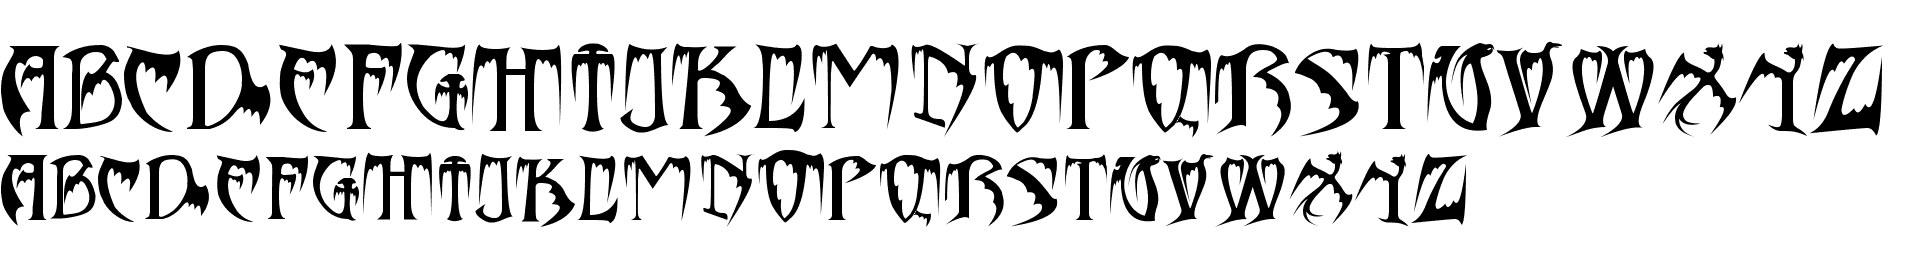 Bats&Dragons-Abaddon